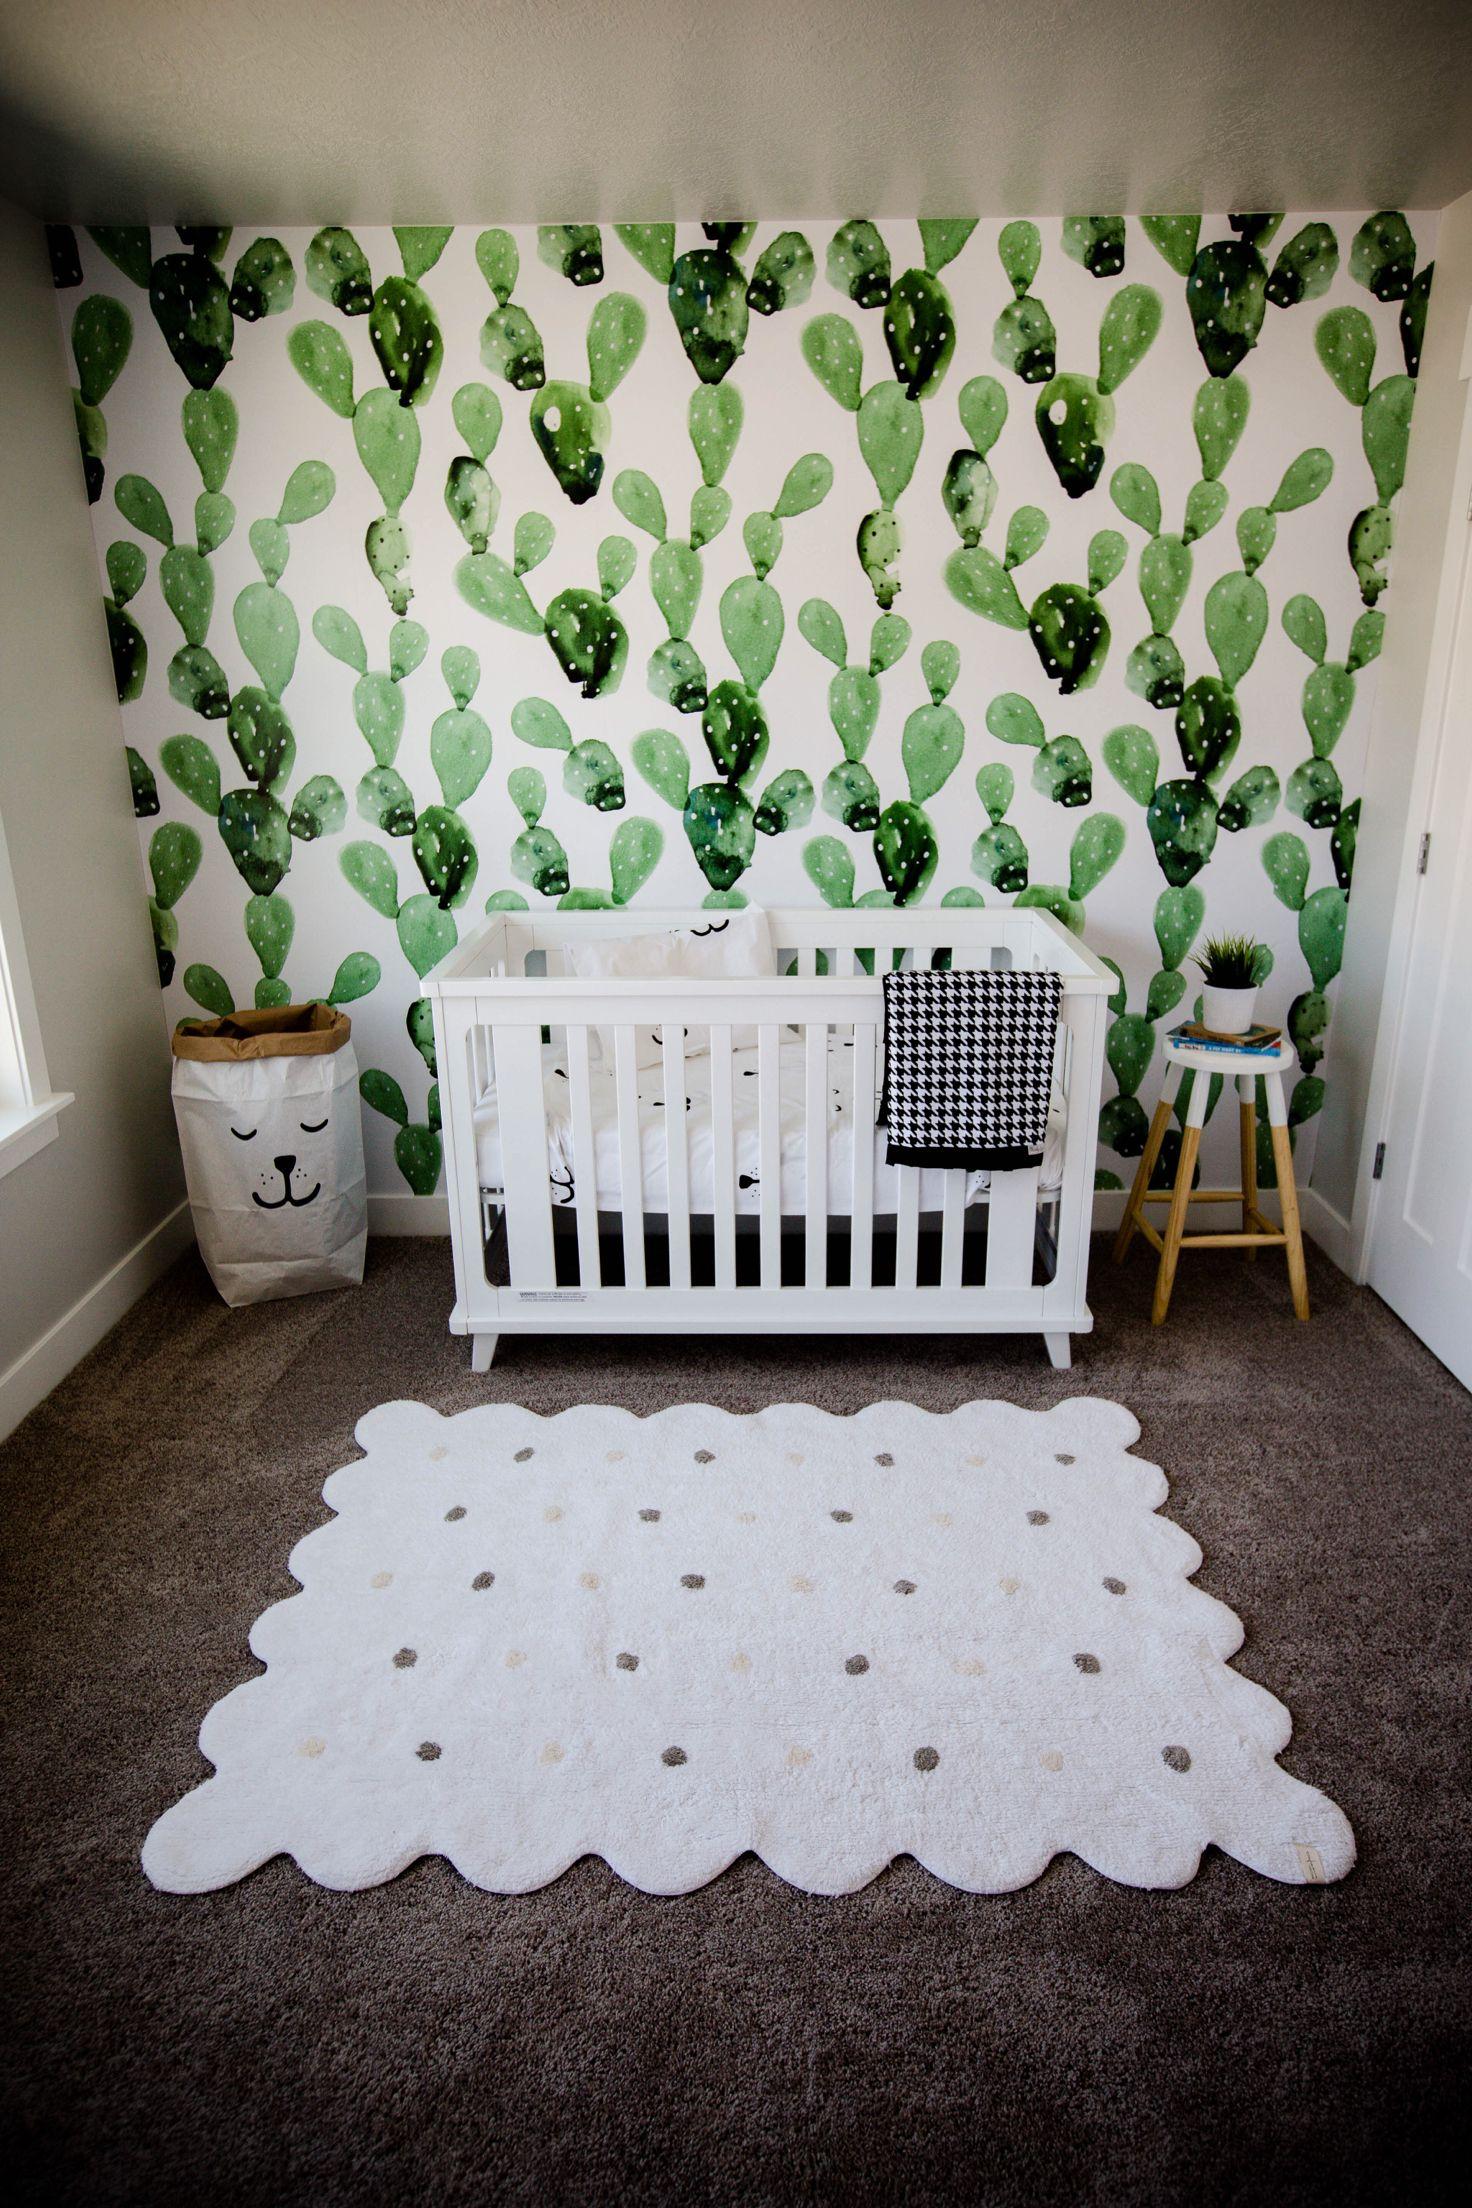 Nursery Cactus Nursery Baby Boy Gender Neutral Anewall